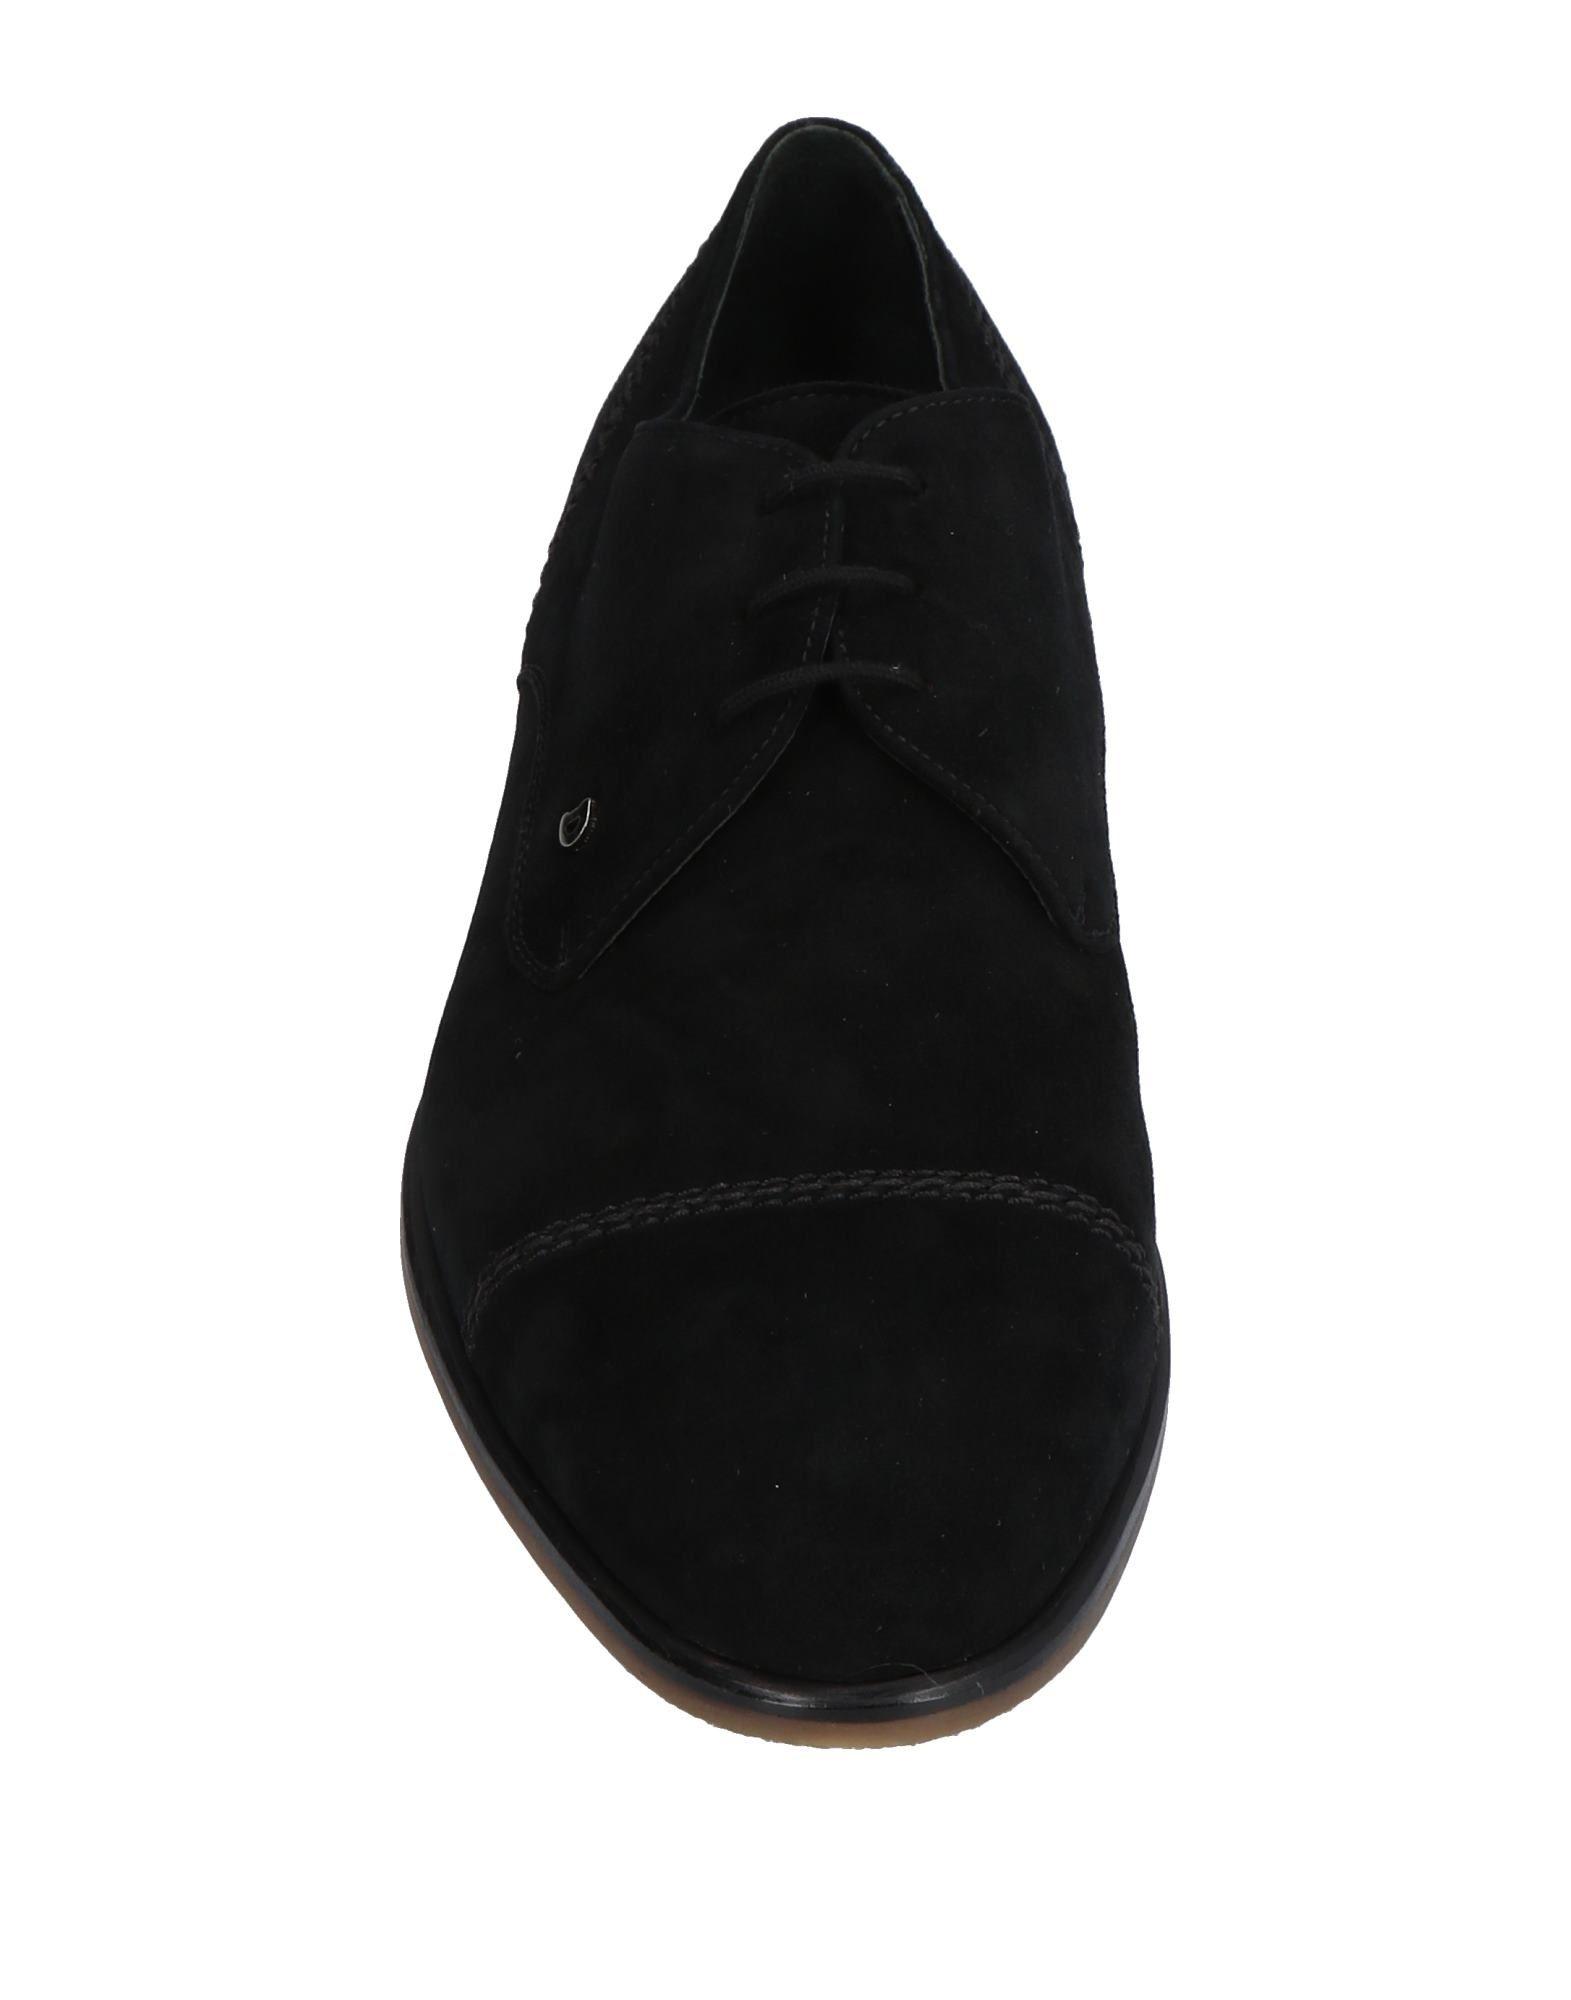 Chaussures À Lacets Dibrera By Paolo Zanoli Femme - Chaussures À Lacets Dibrera By Paolo Zanoli sur